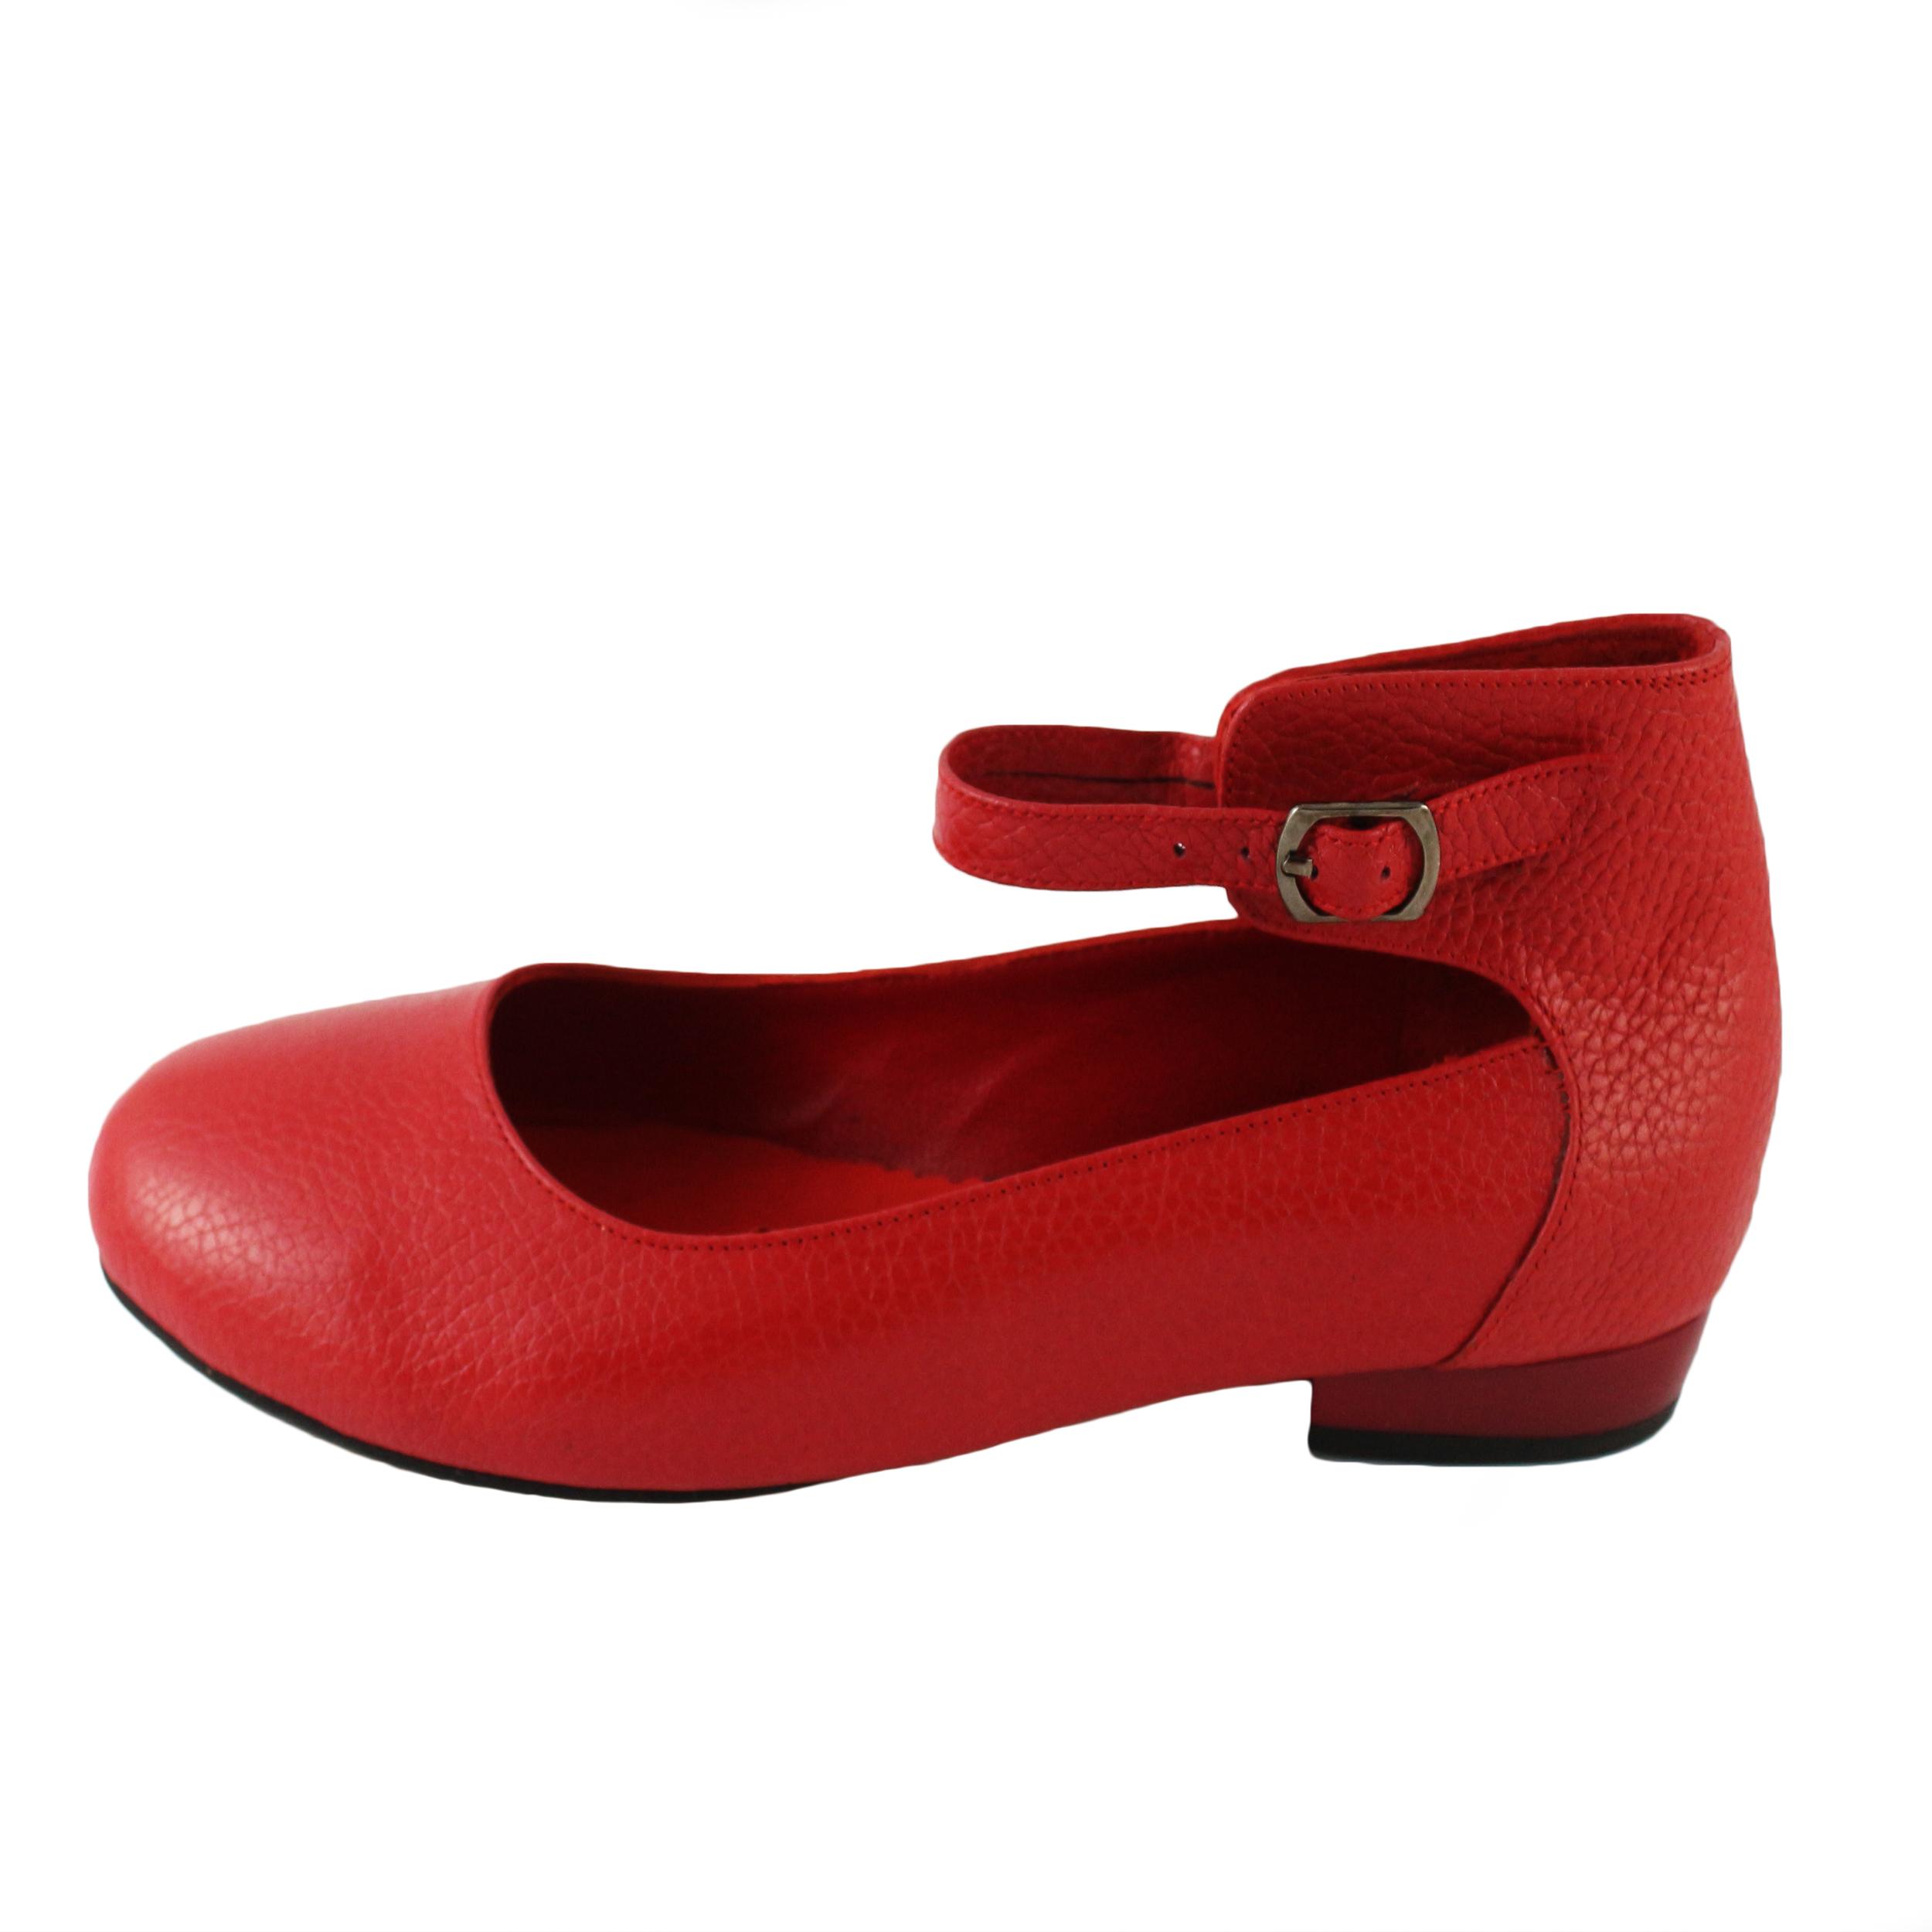 کفش زنانه ریگاردو مدل ویونا